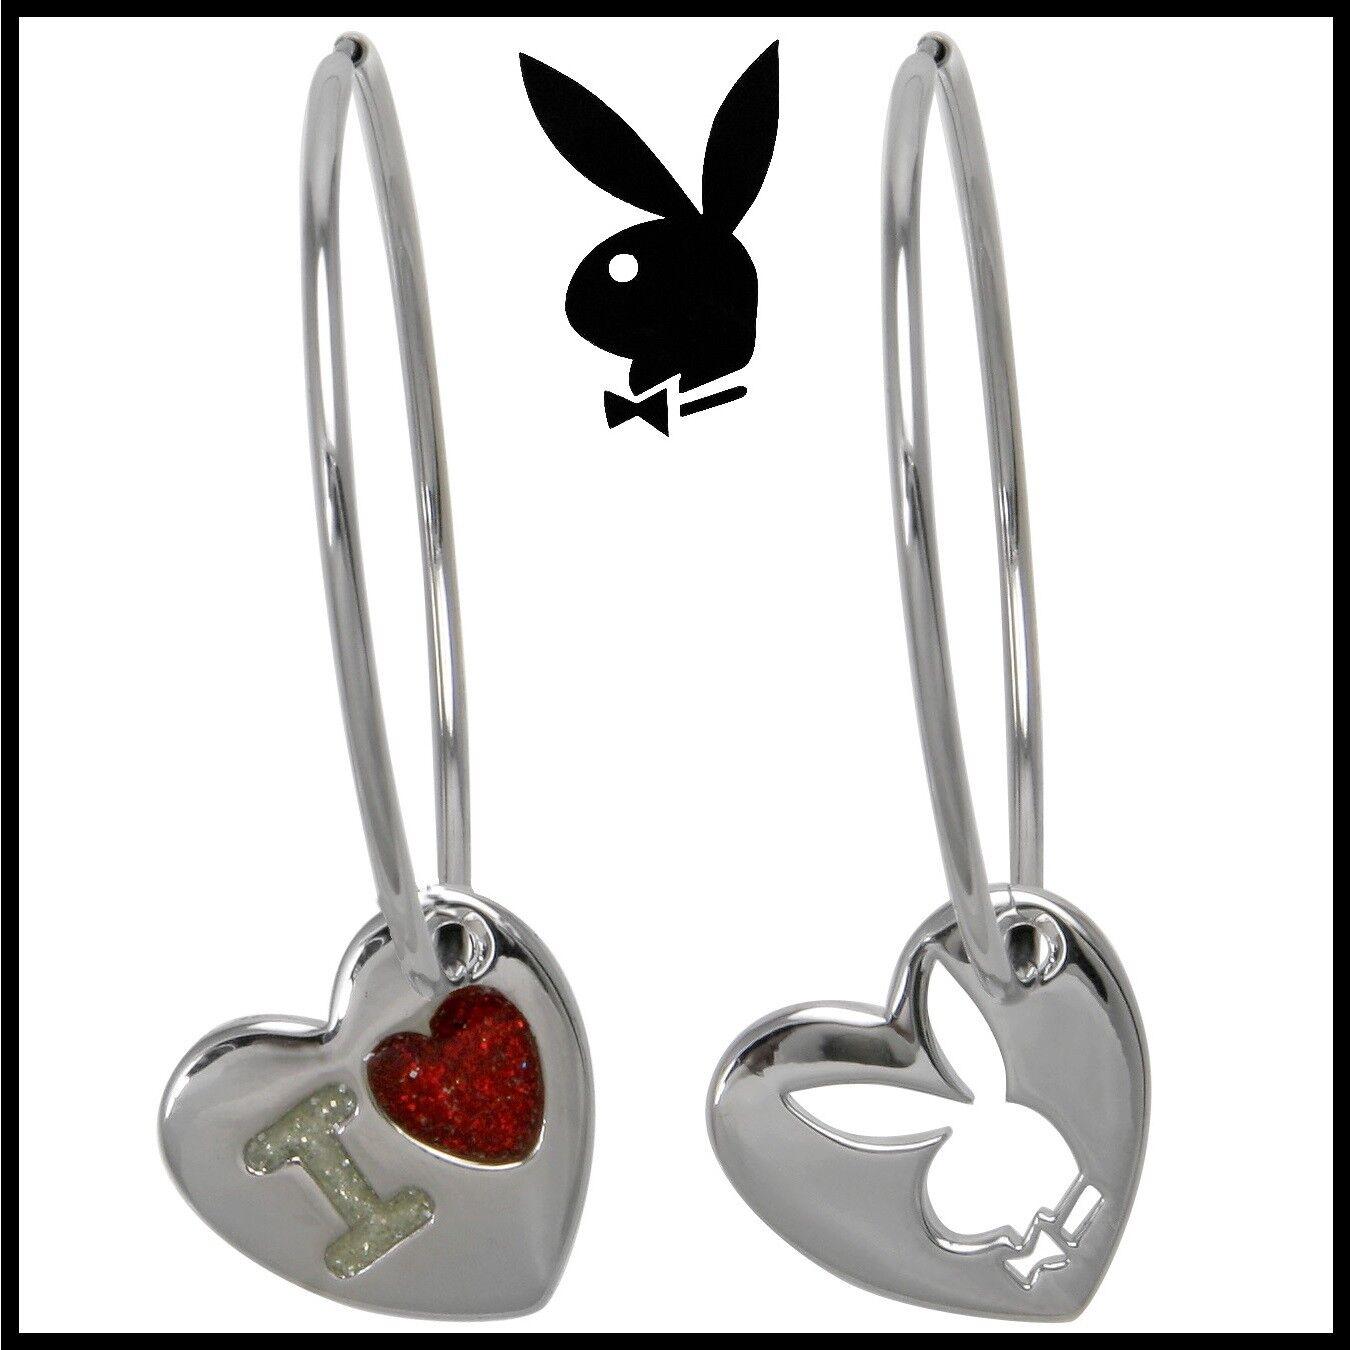 Square Bunny Playboy Logo Rabbit  Crop Cropped Ringer TShirt Tee Y2K Kawaii Cute Art Hoe Culture Harajuku Vintage Retro KPOP Aesthetic